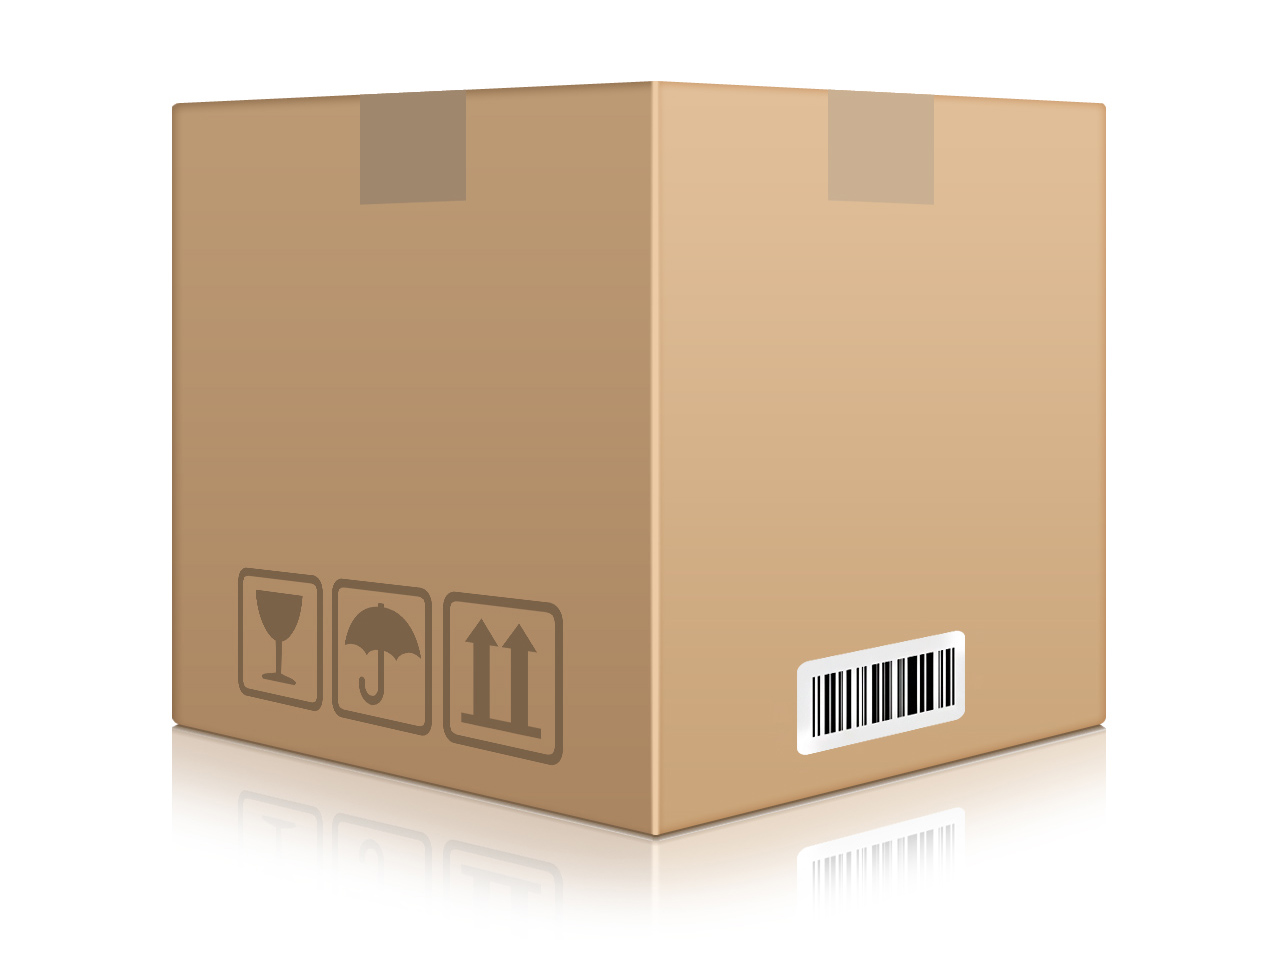 in thùng carton kỹ thuật in offset